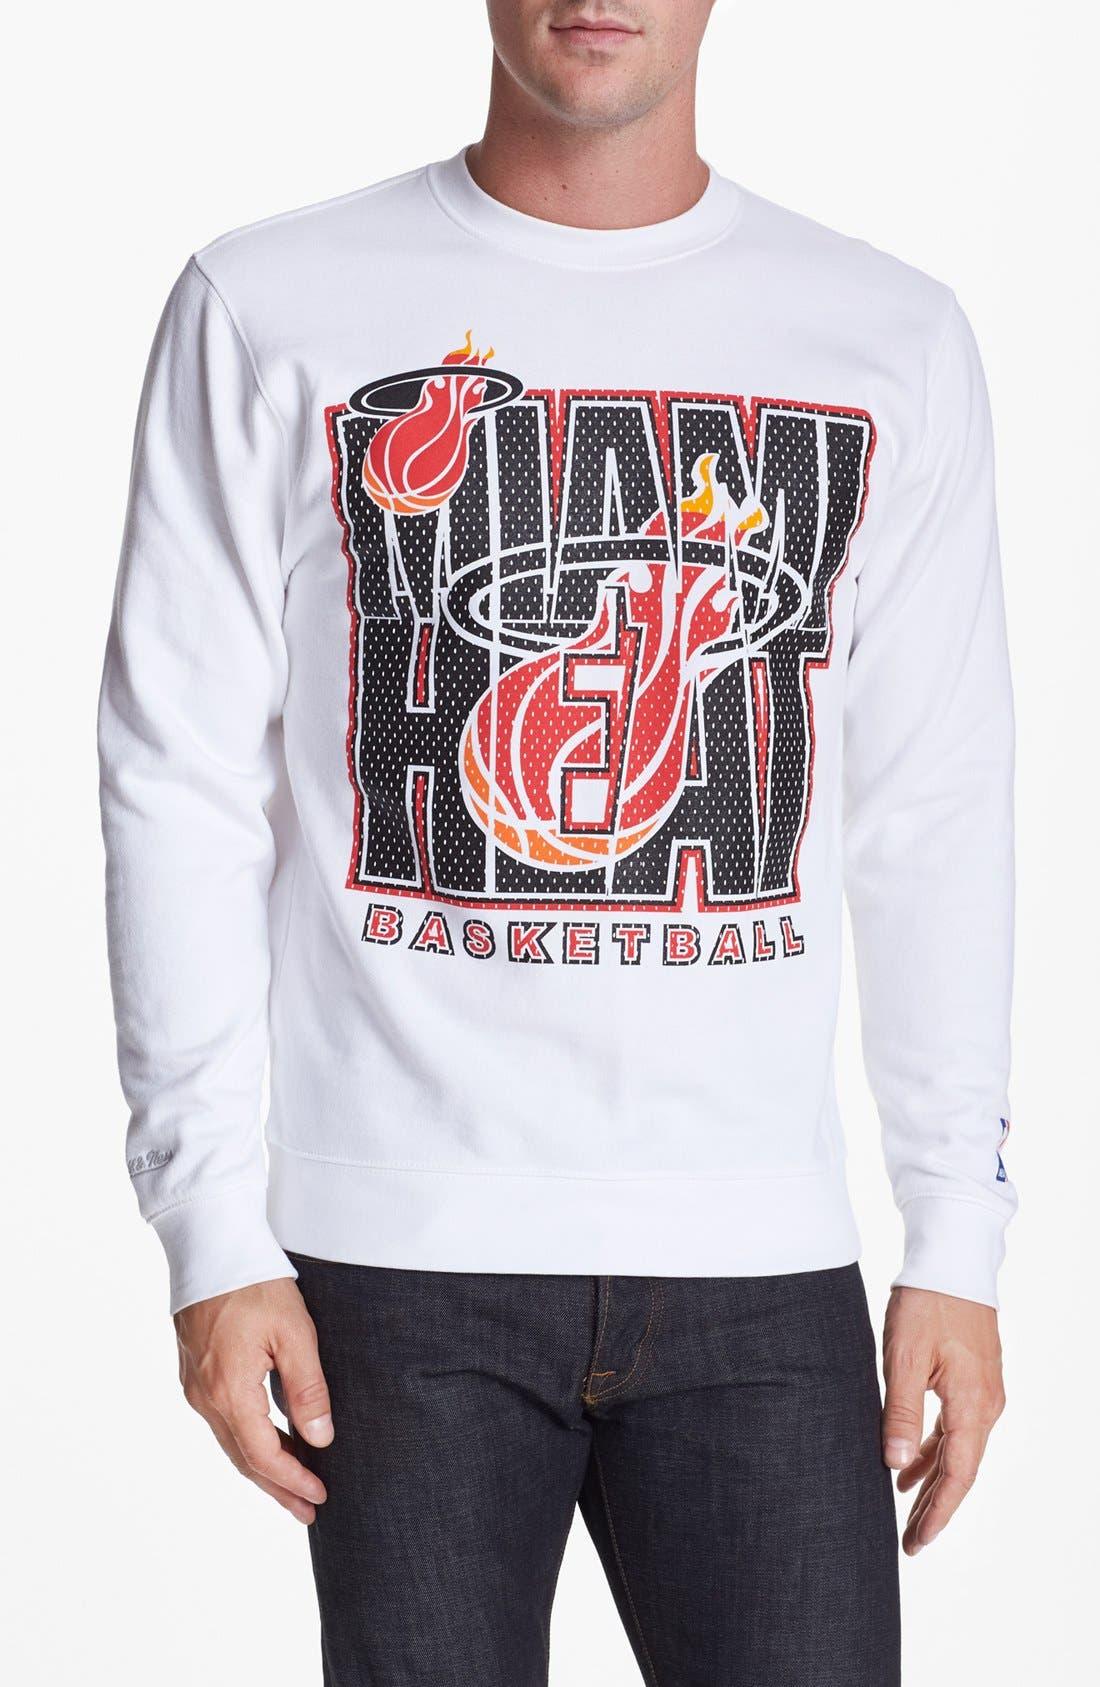 Alternate Image 1 Selected - Mitchell & Ness 'Miami Heat' Sweatshirt